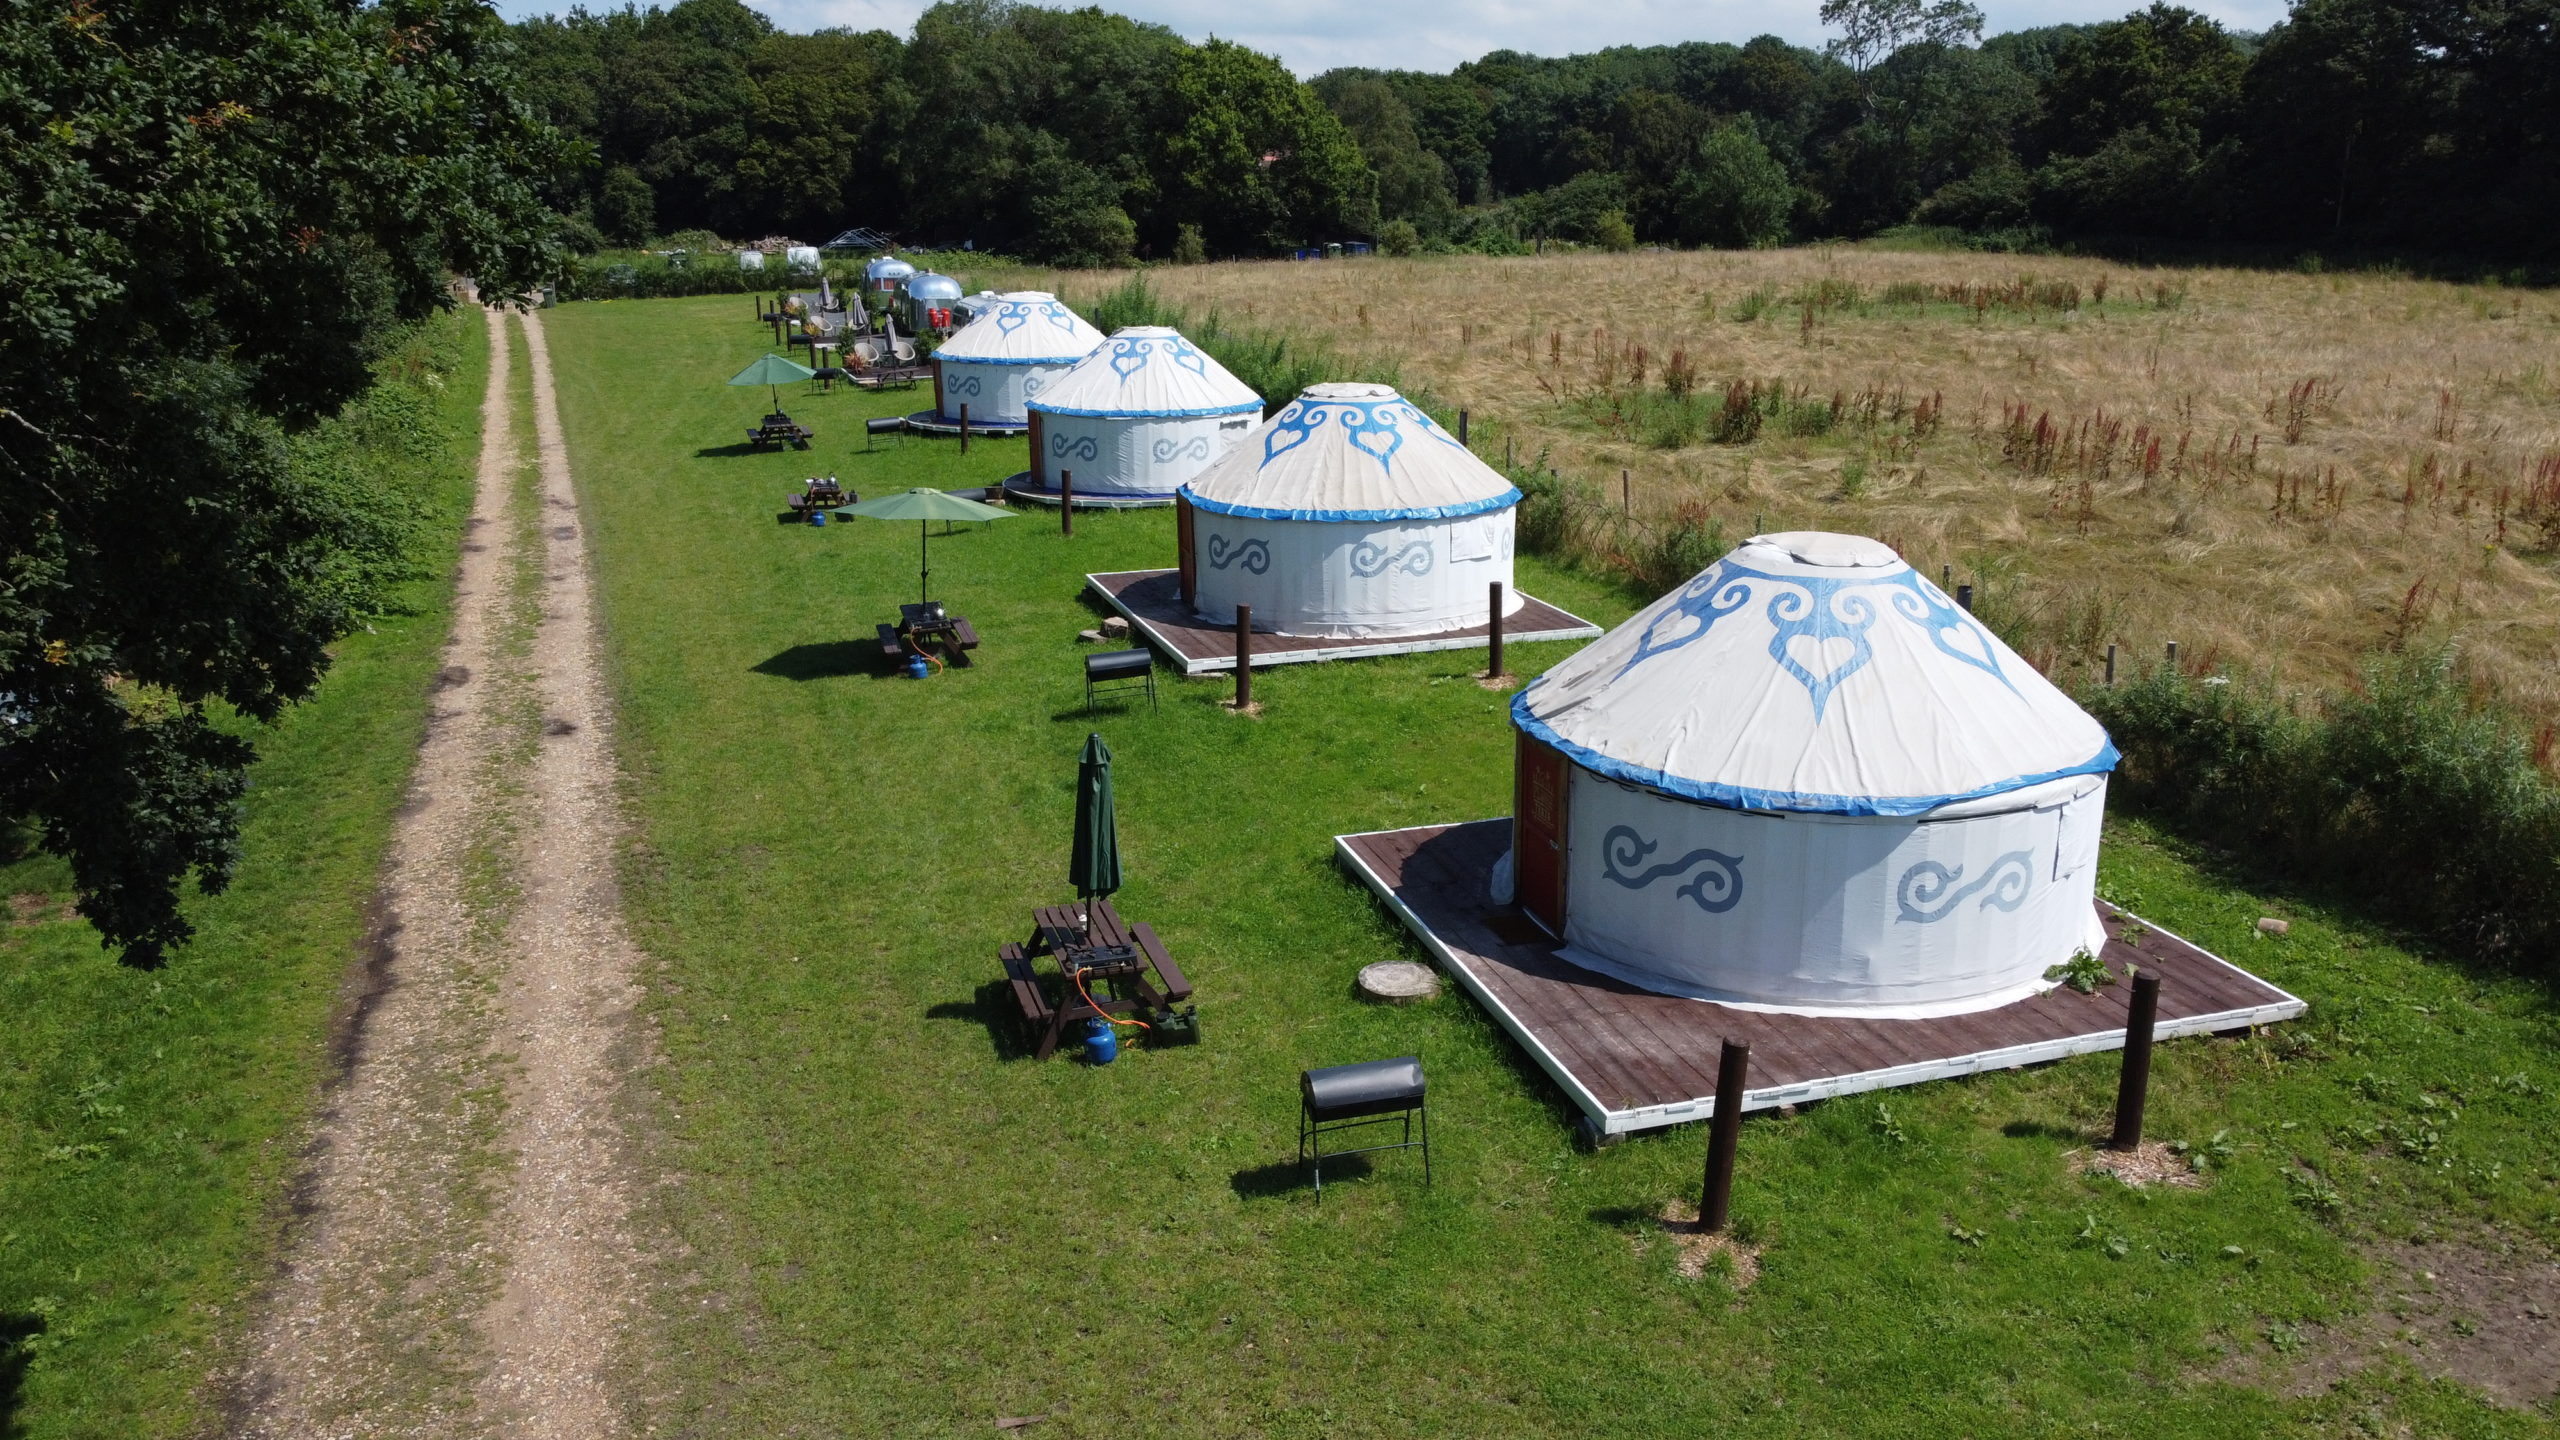 Field Yurts Plush Tents Glamping